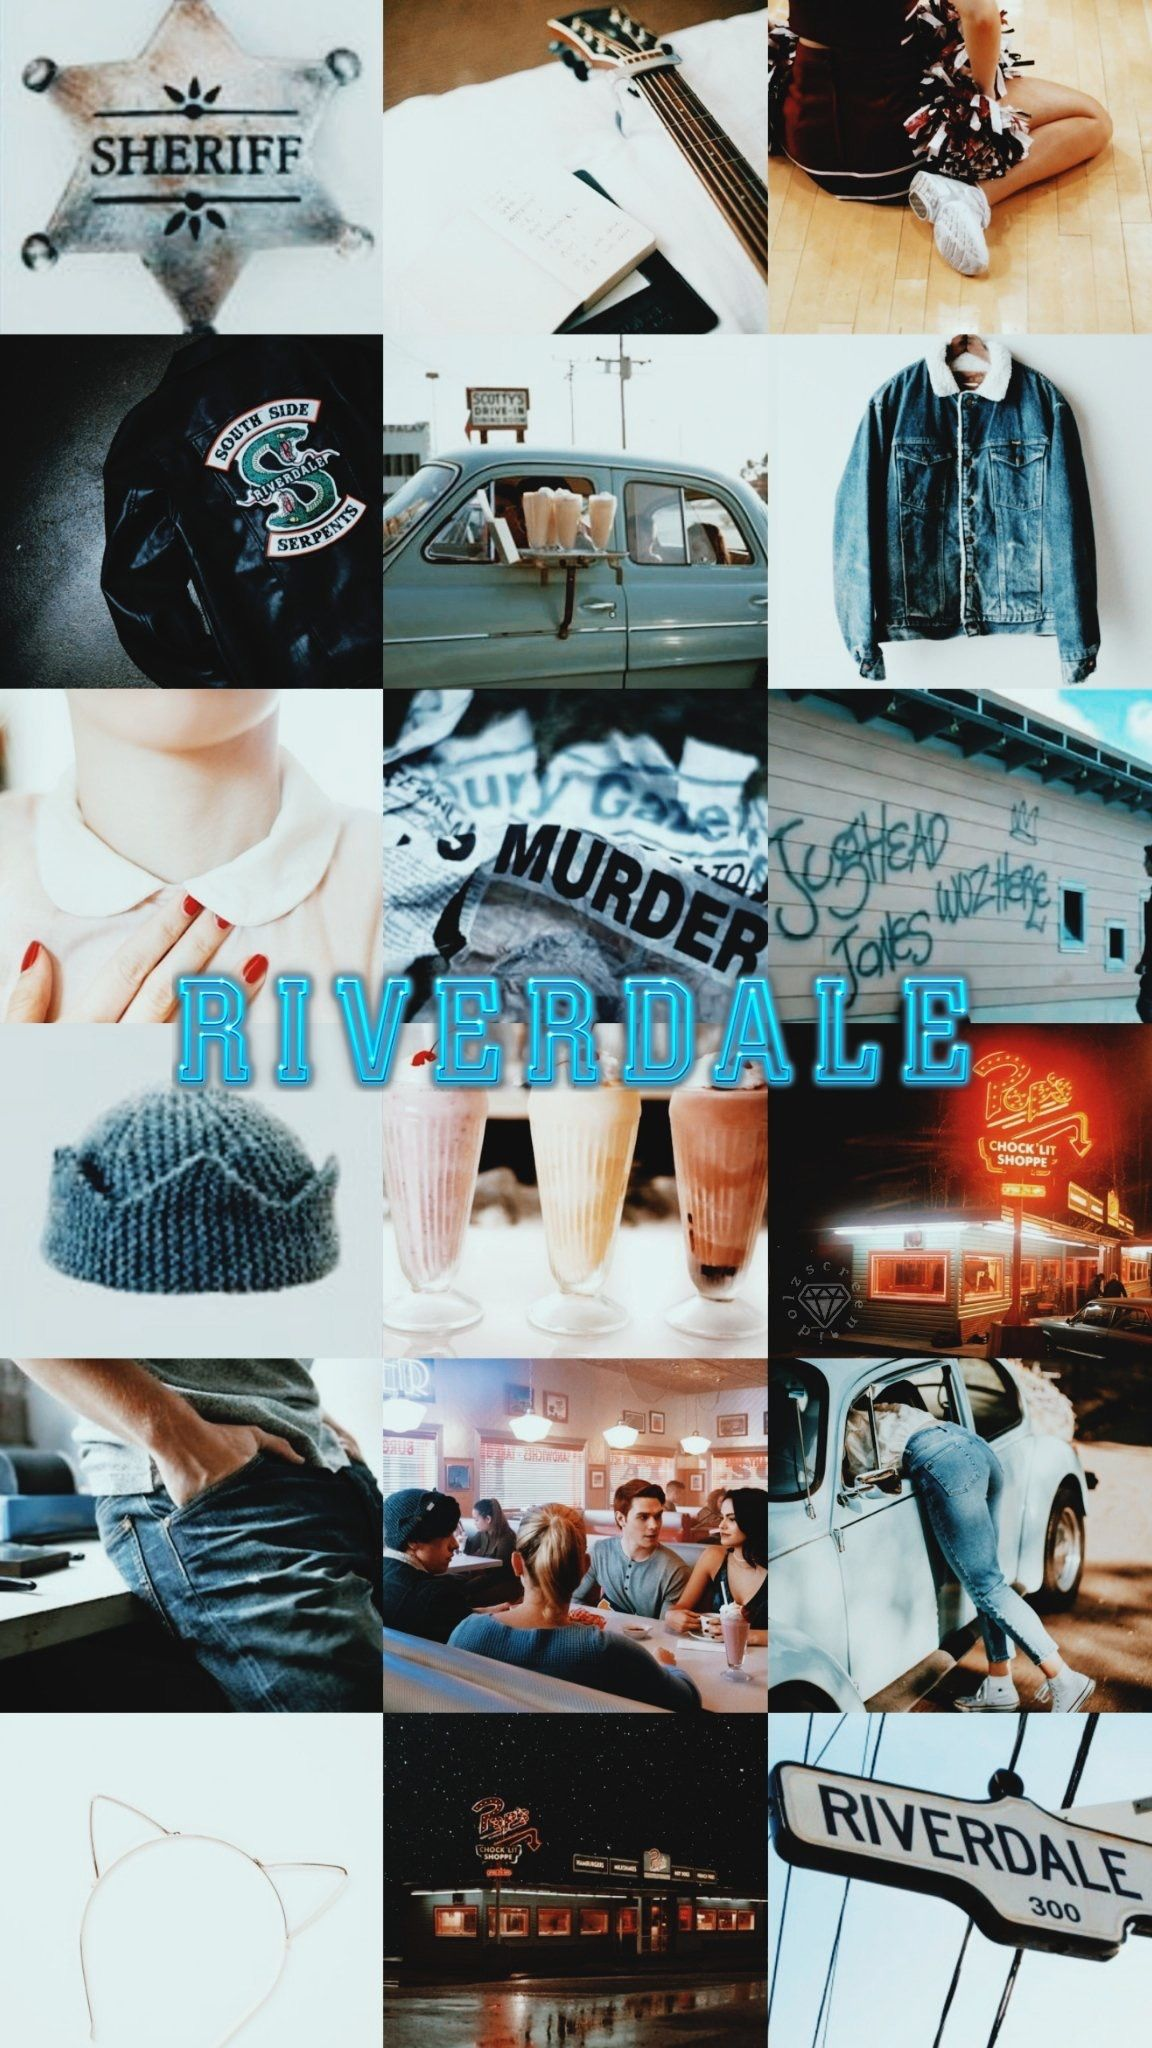 Riverdale Wallpaper Aesthetic Riverdale 231130 Hd Wallpaper